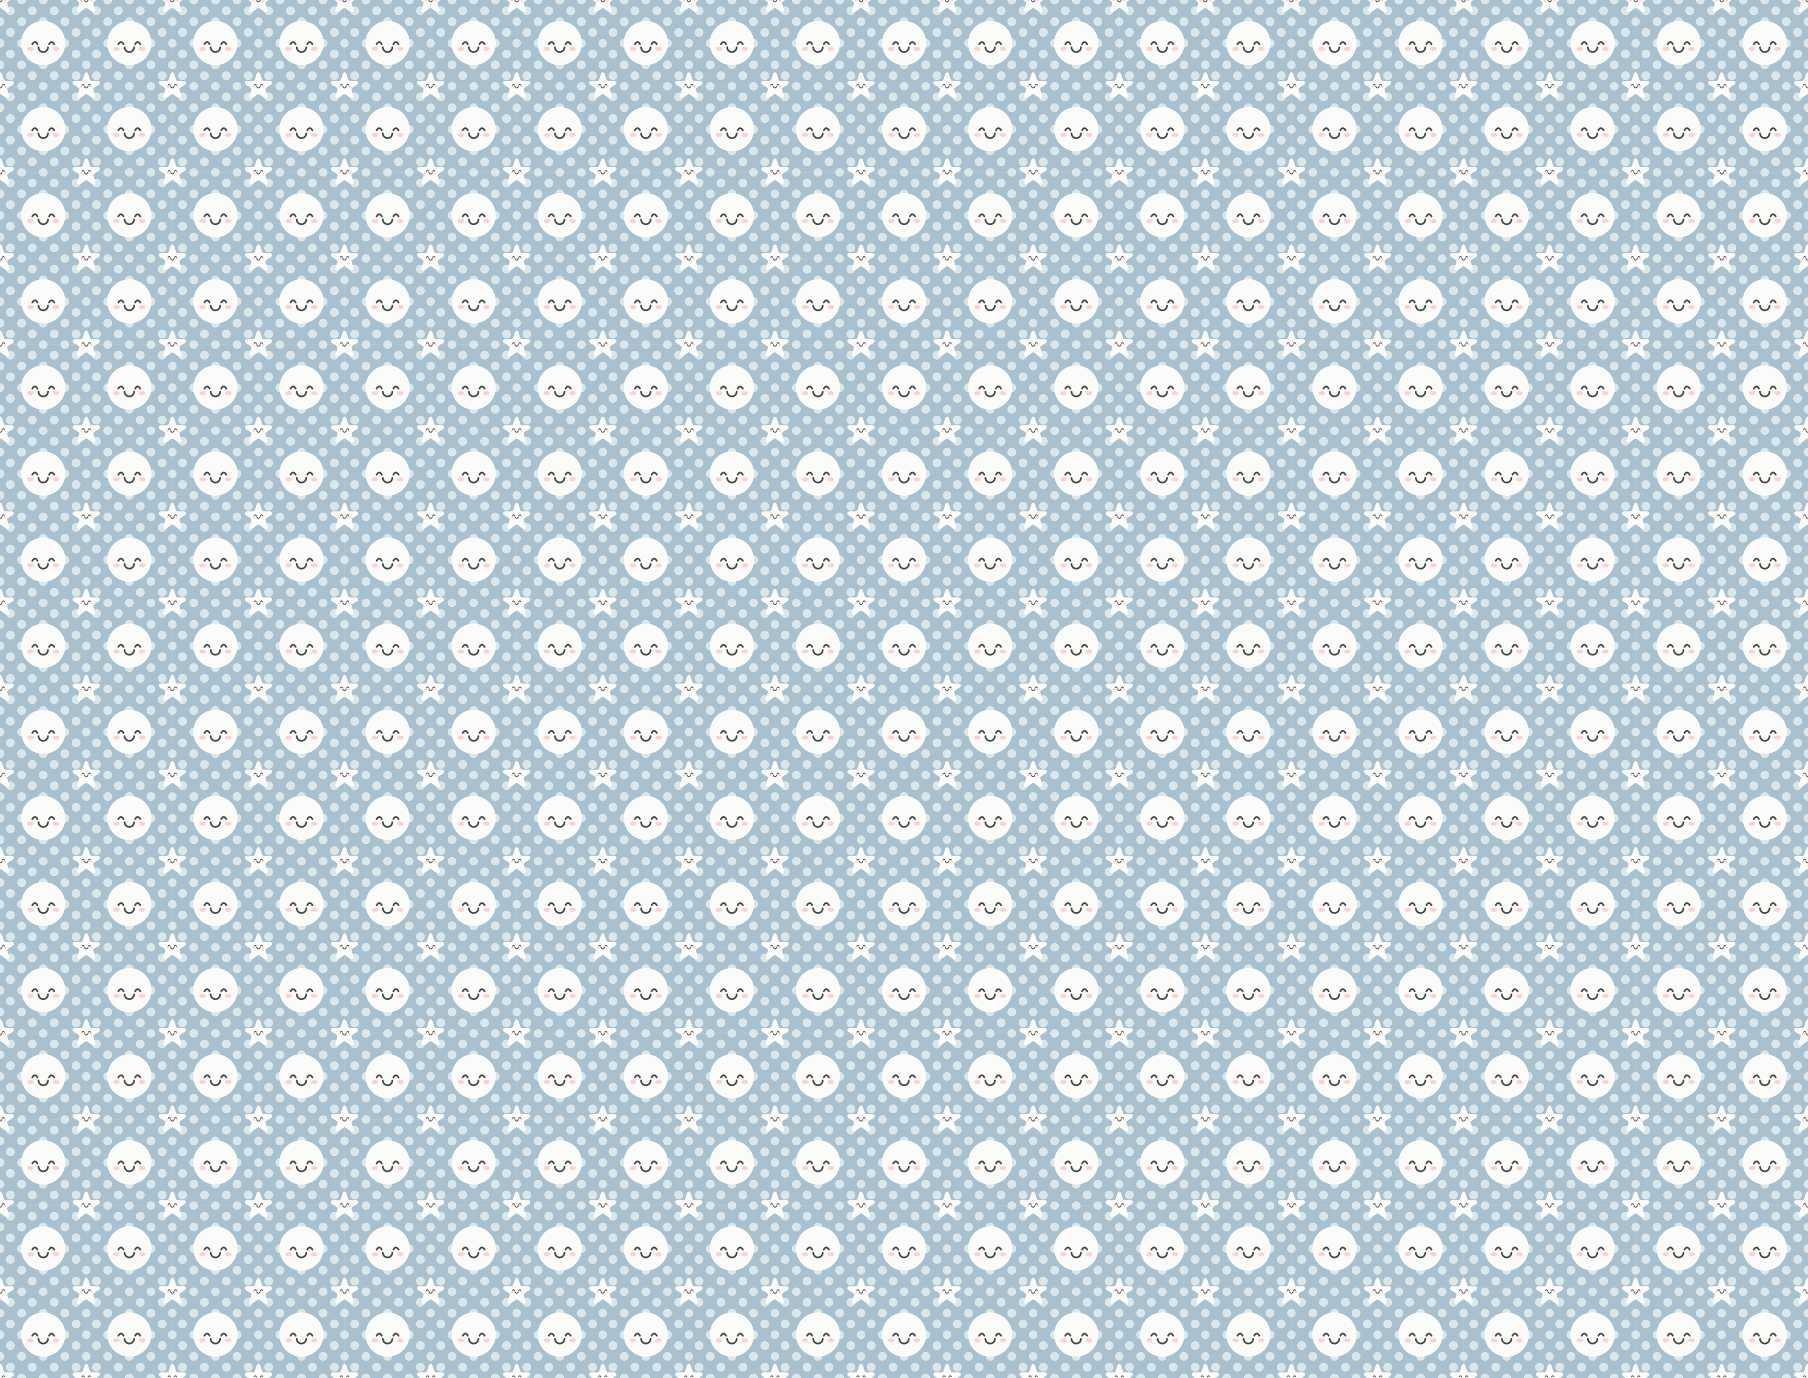 Papel de Parede Autocolante Floral Fundo Azul